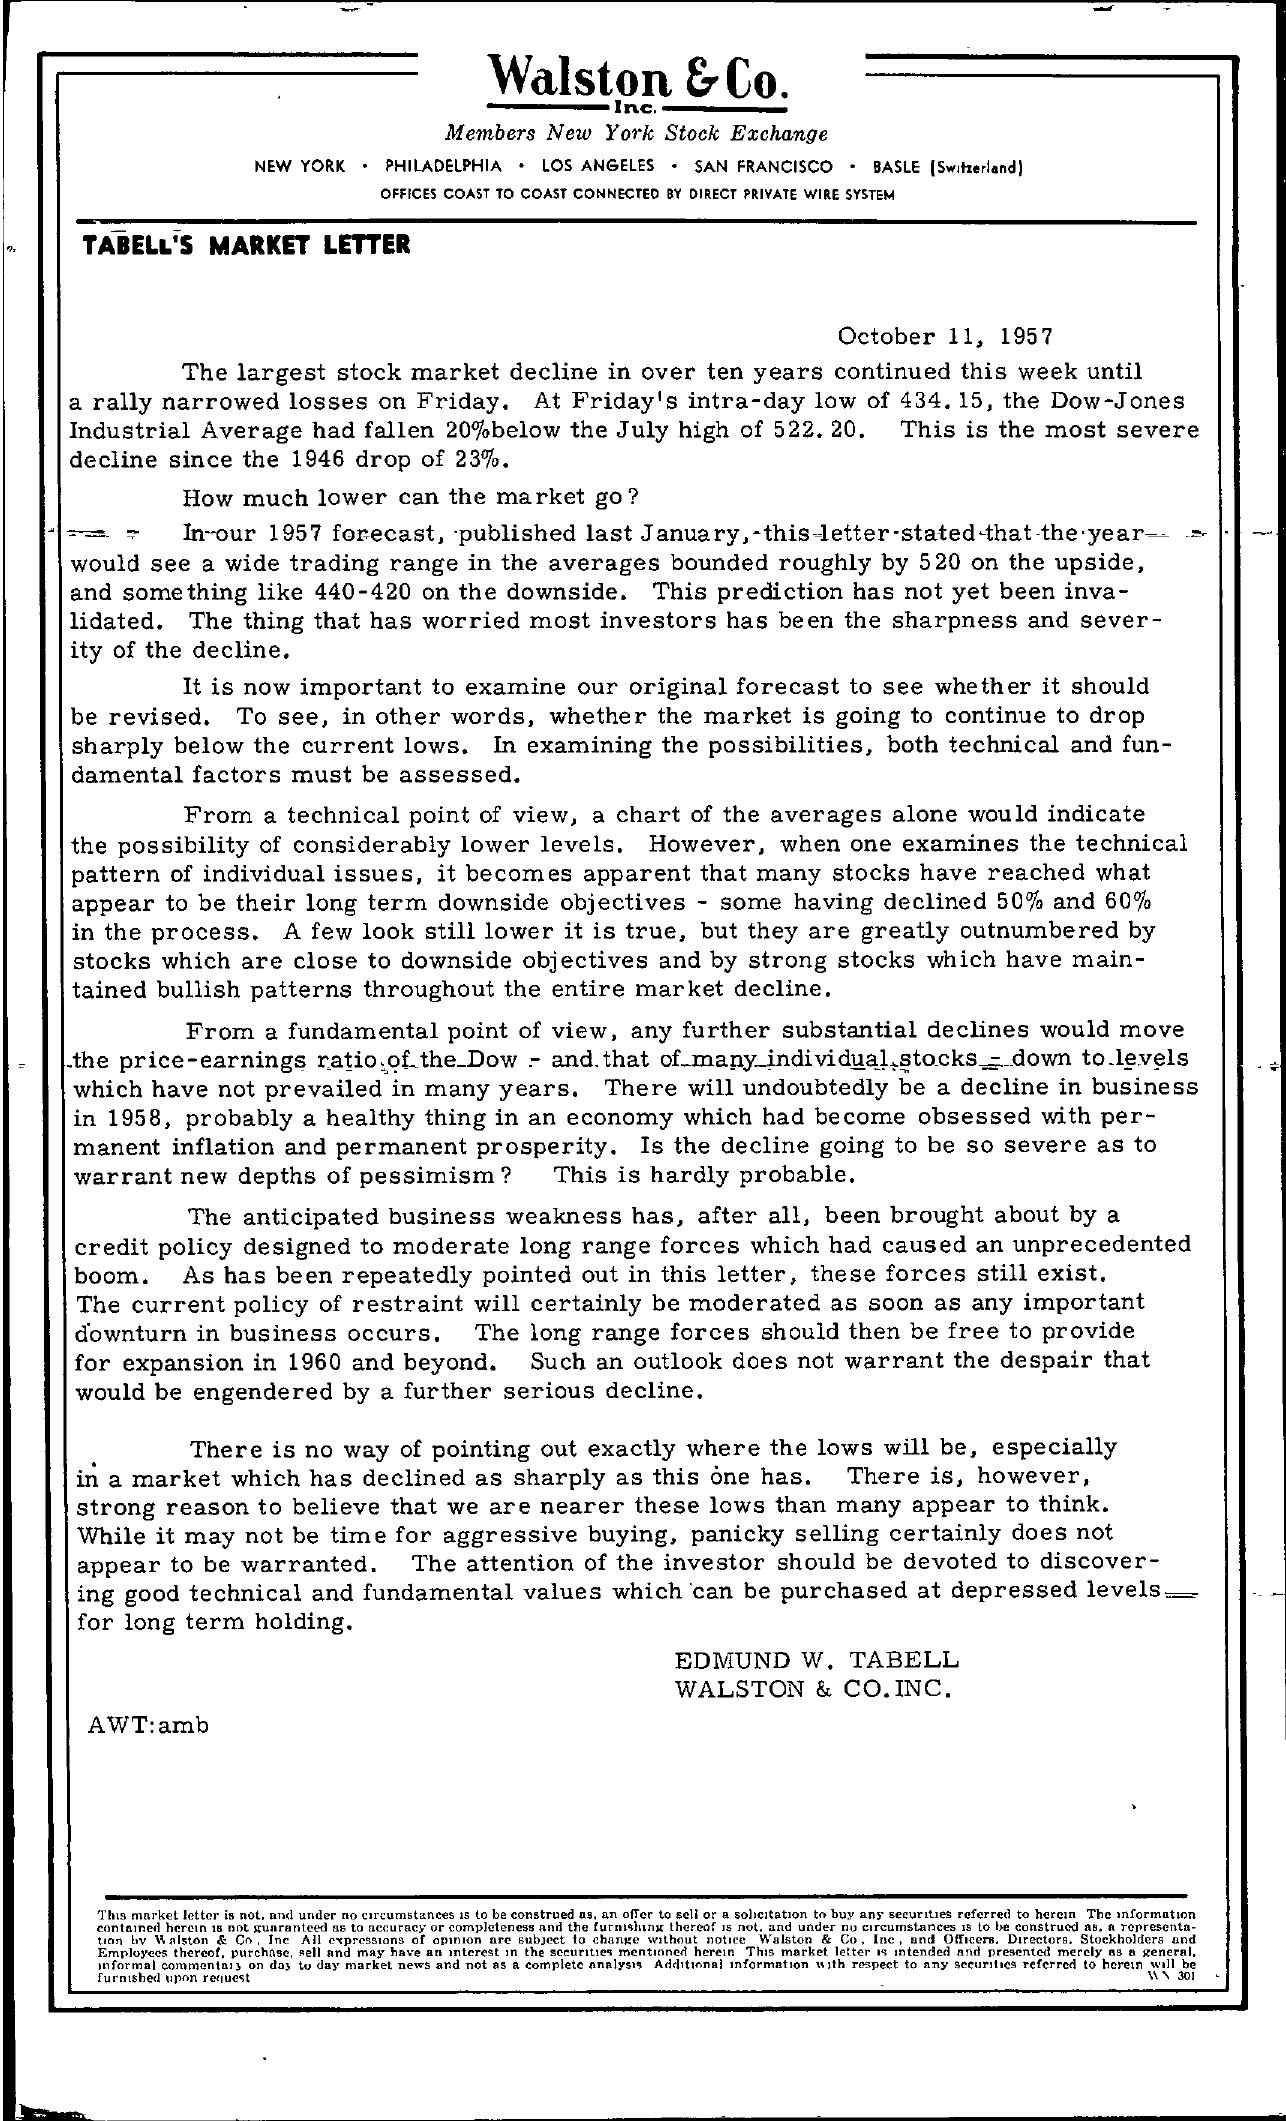 Tabell's Market Letter - October 11, 1957